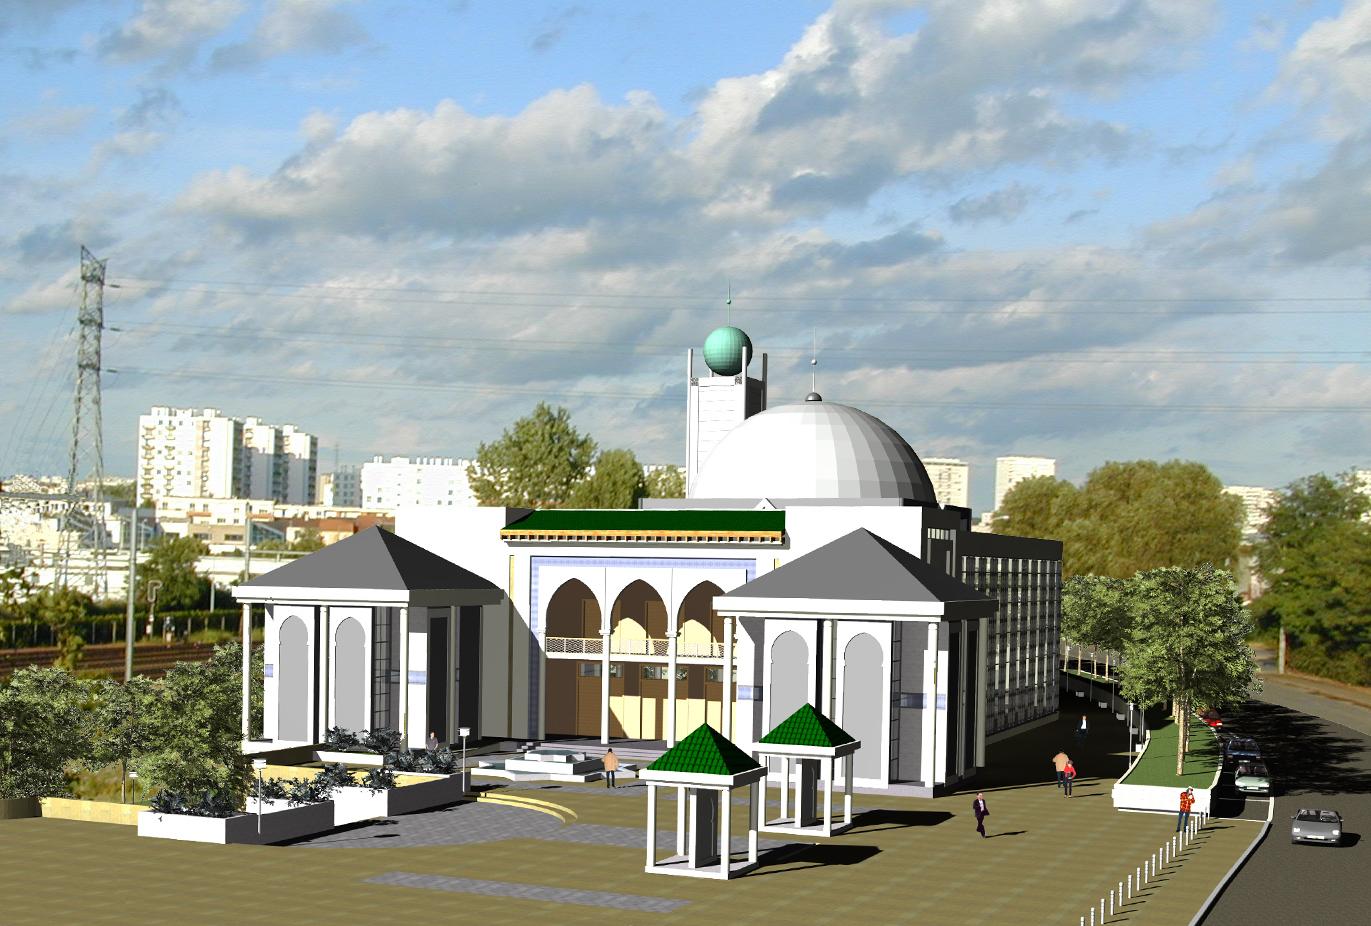 rencontre musulmane mariage en france Neuilly-sur-Seine